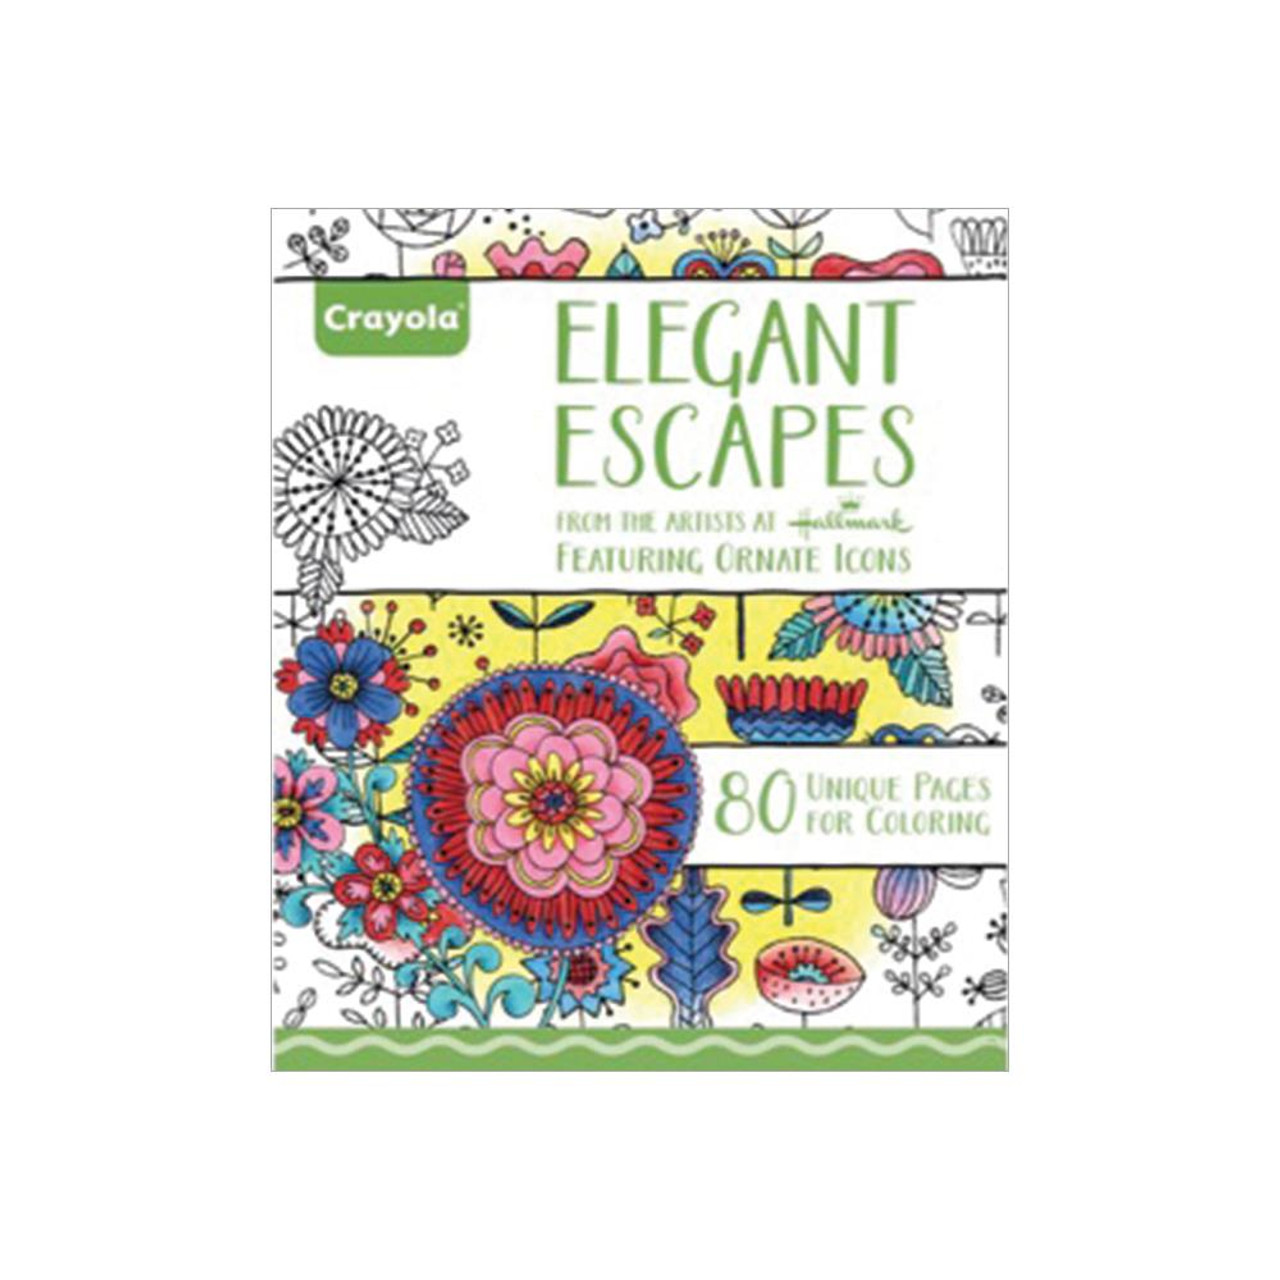 Crayola Coloring Books: Elegant Escapes - Scrapbook Generation